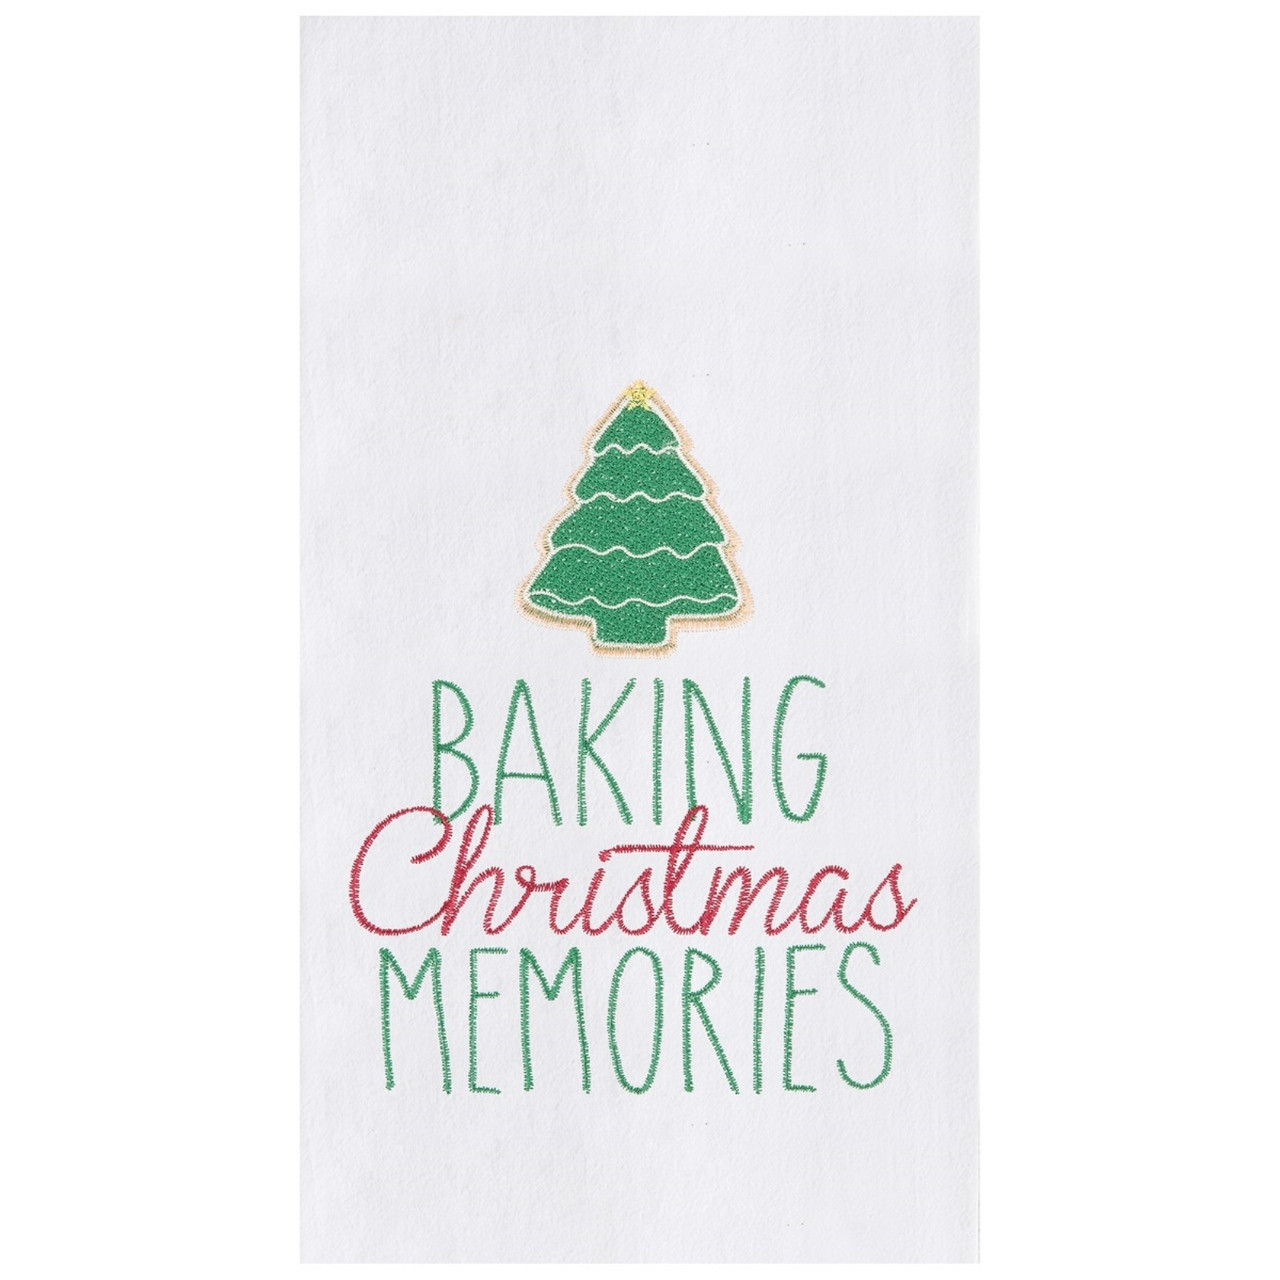 Christmas Memories.Baking Christmas Memories Cookies Holiday Kitchen Flour Sack Dish Towel